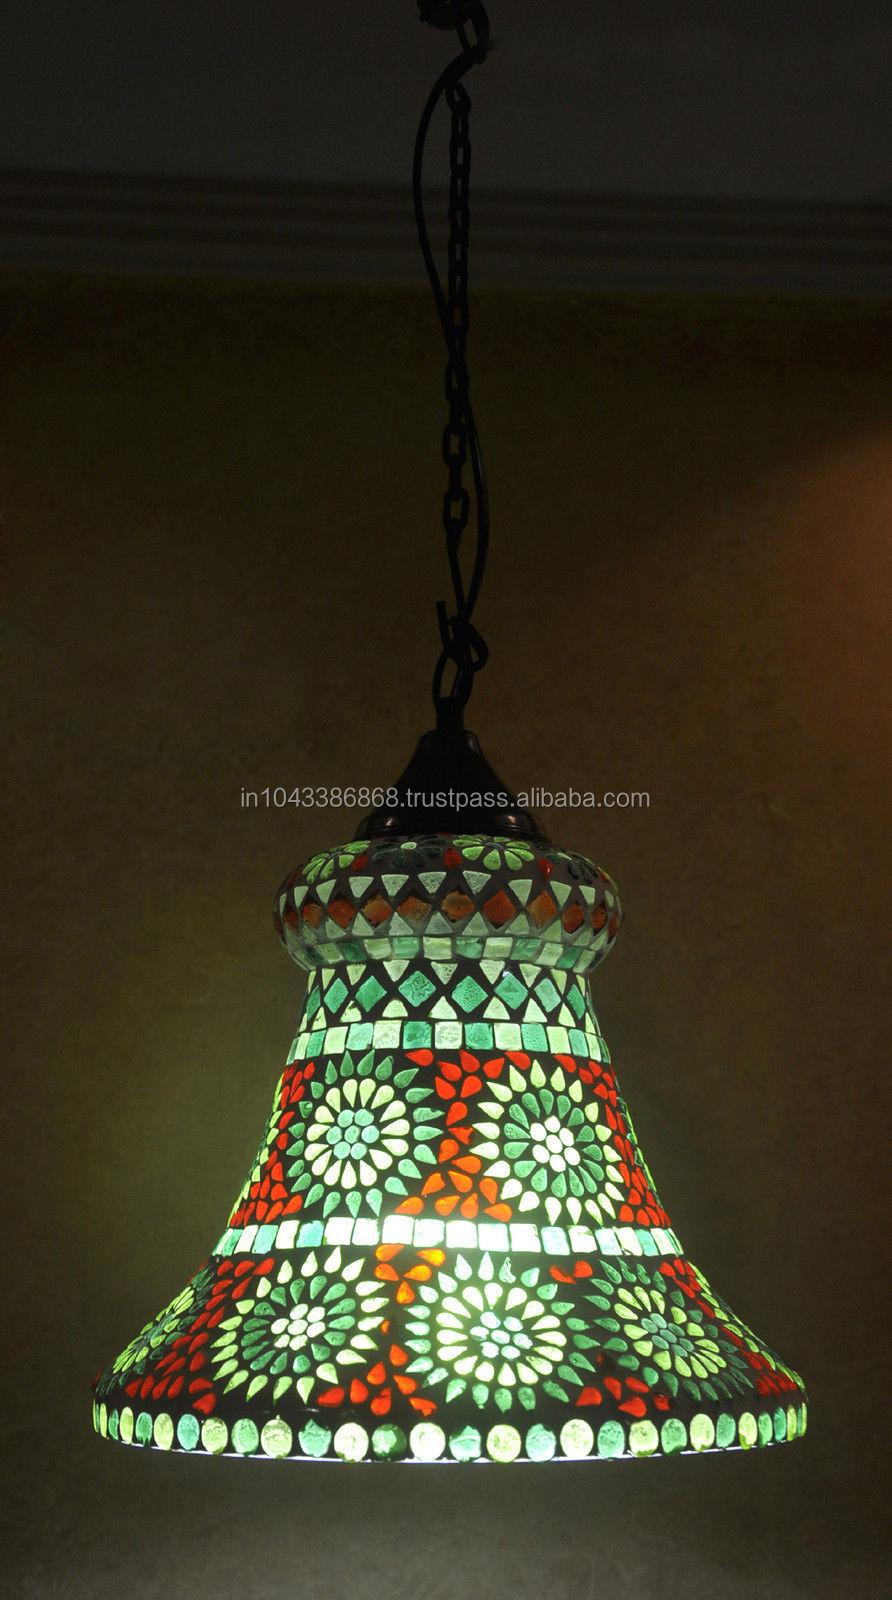 Fonkelnieuw Traditionele Indiase Vintage Home Decoratieve Glazen Plafond Lamp HW-48